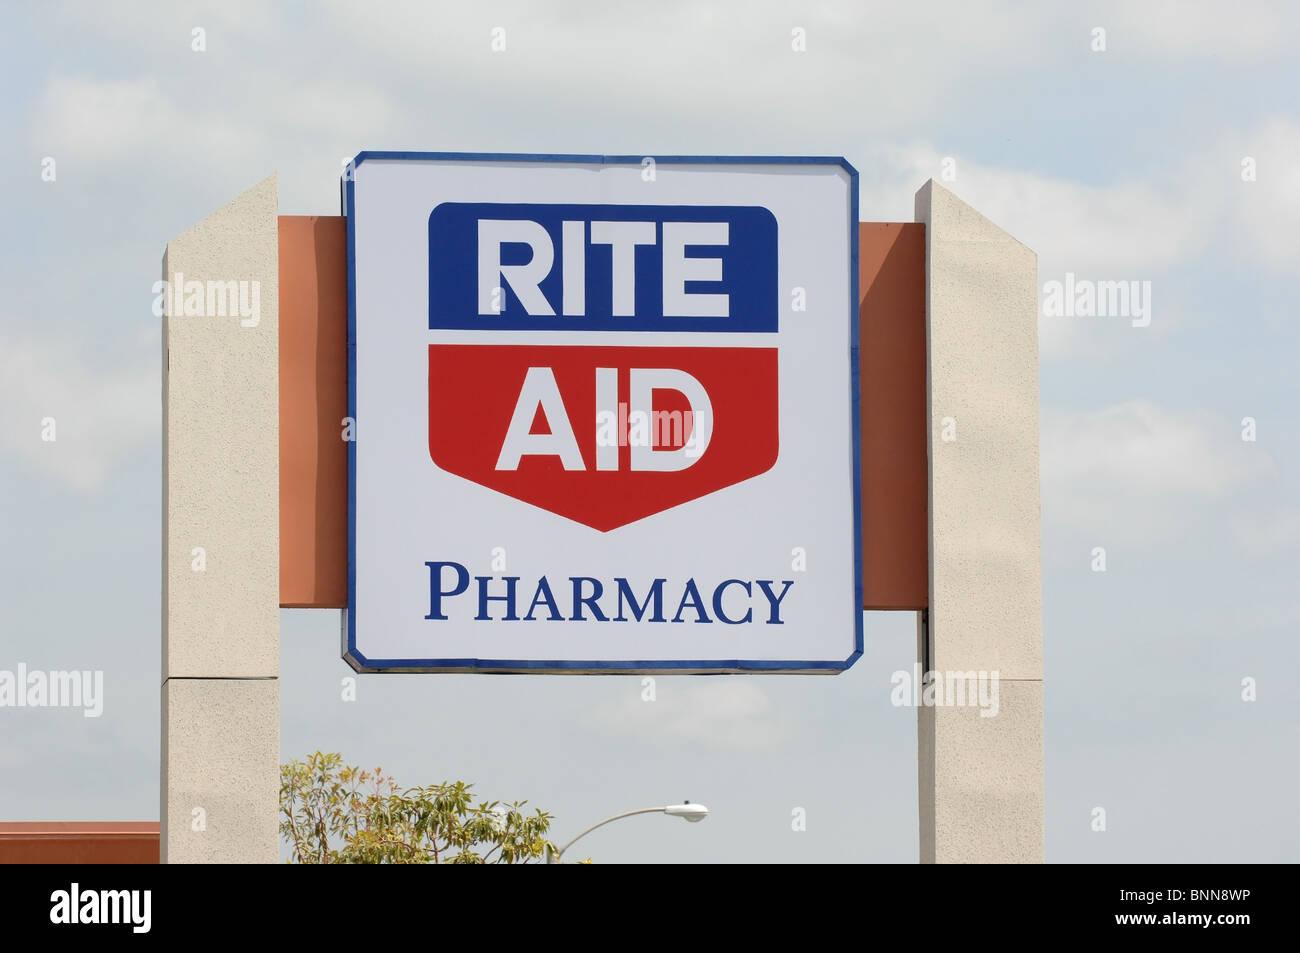 Rite Aid Pharmacy in Orange, CA - Stock Image